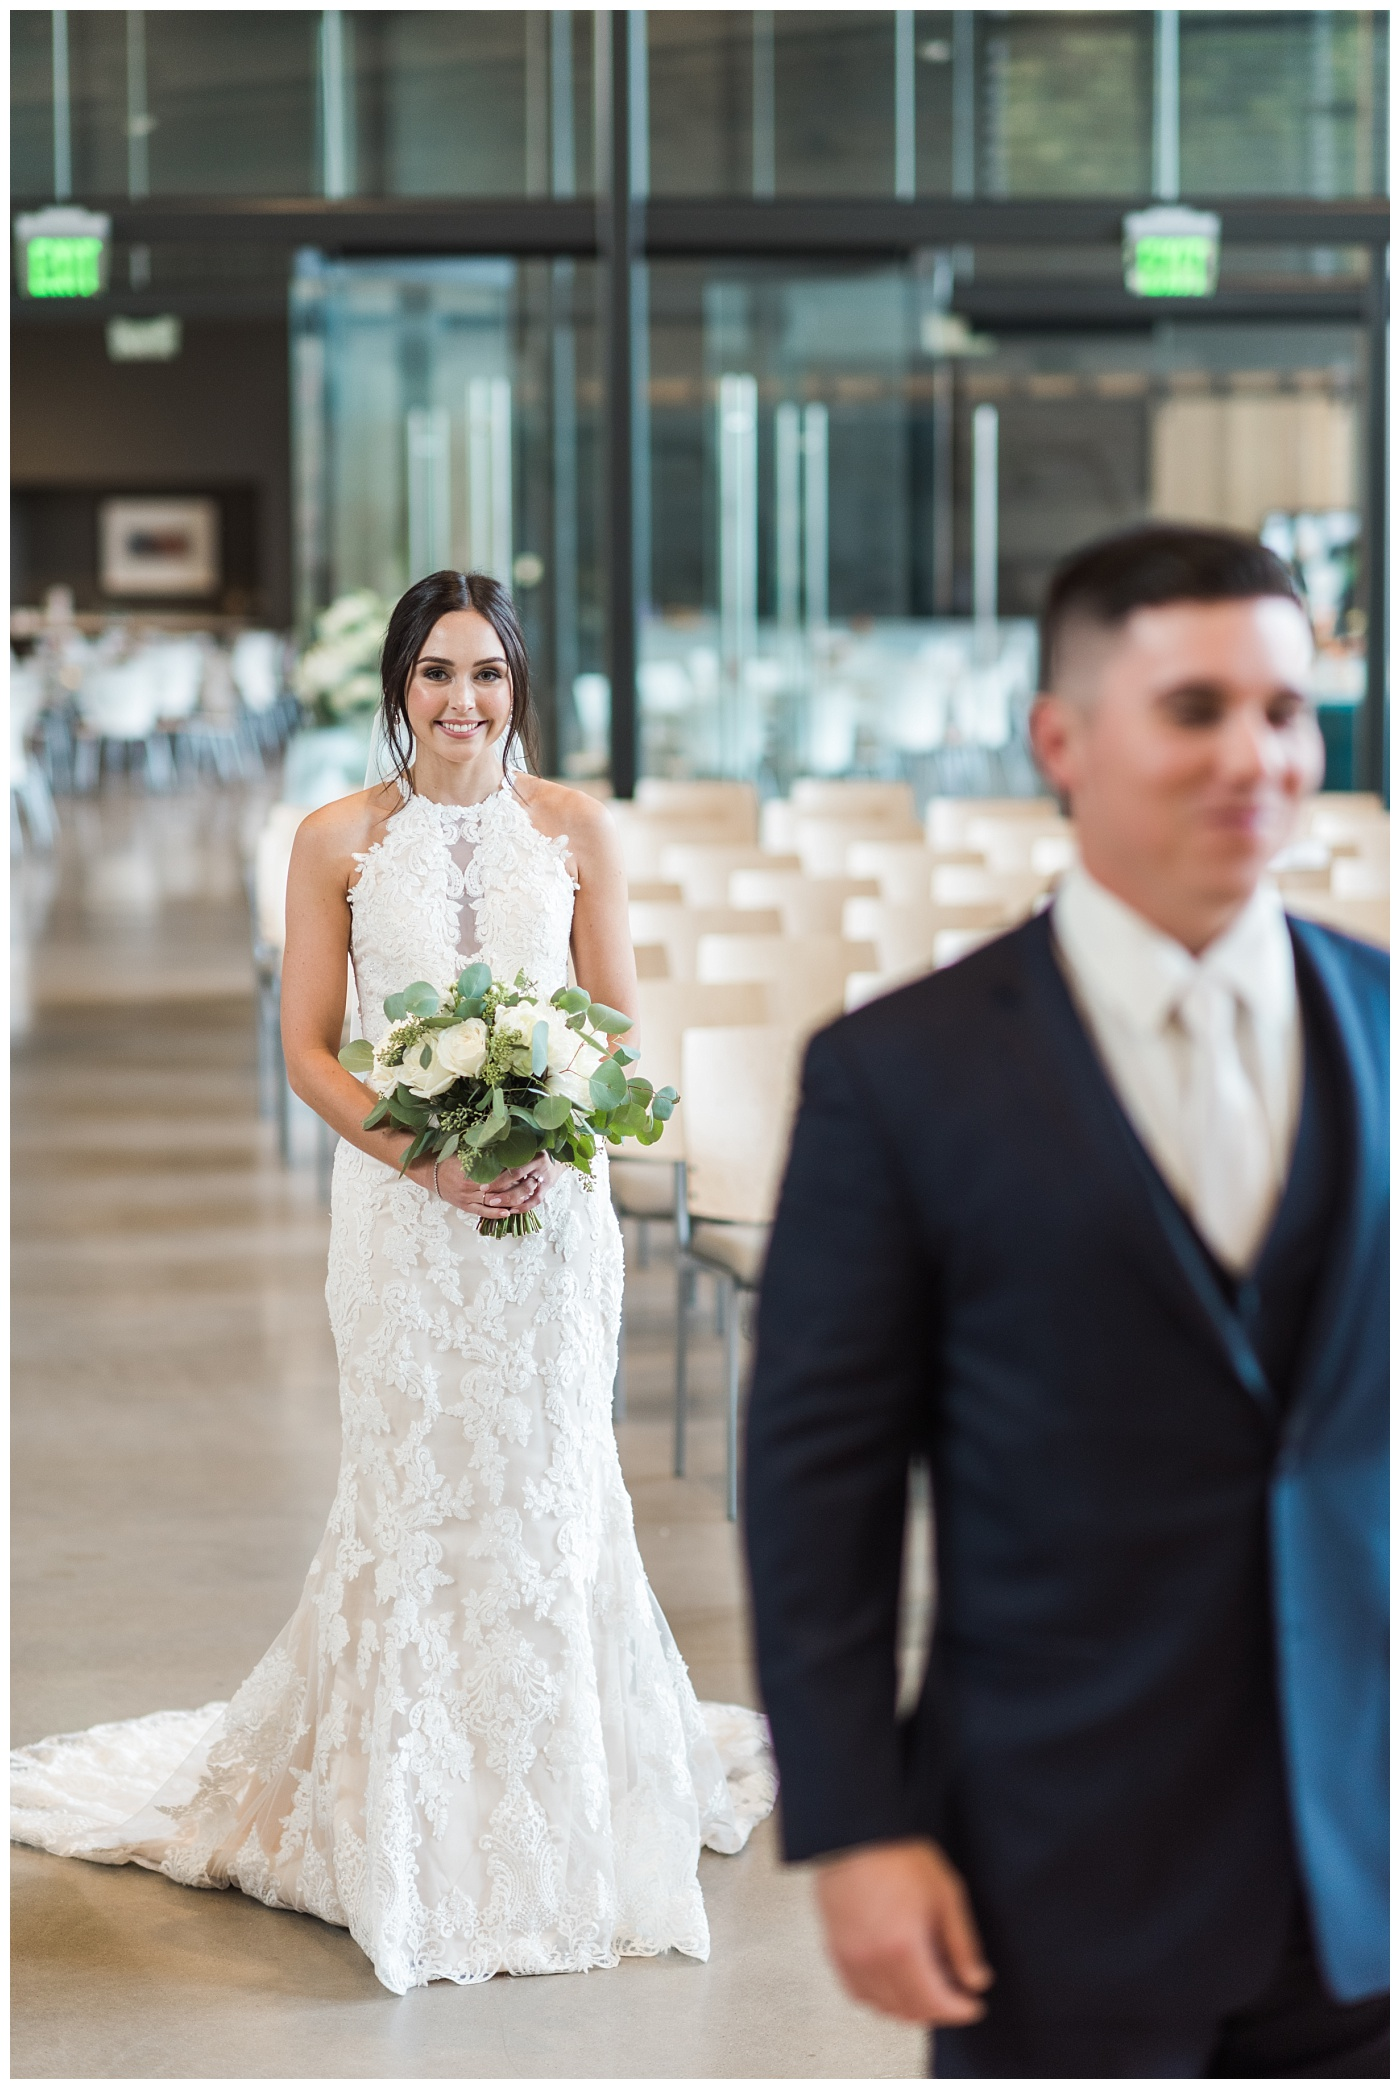 Stephanie Marie Photography Unitarian Universalist Society Church Ceremony Hotel Kirkwood Reception Cedar Rapids Iowa City Wedding Photographer Sean Madison Moore_0028.jpg